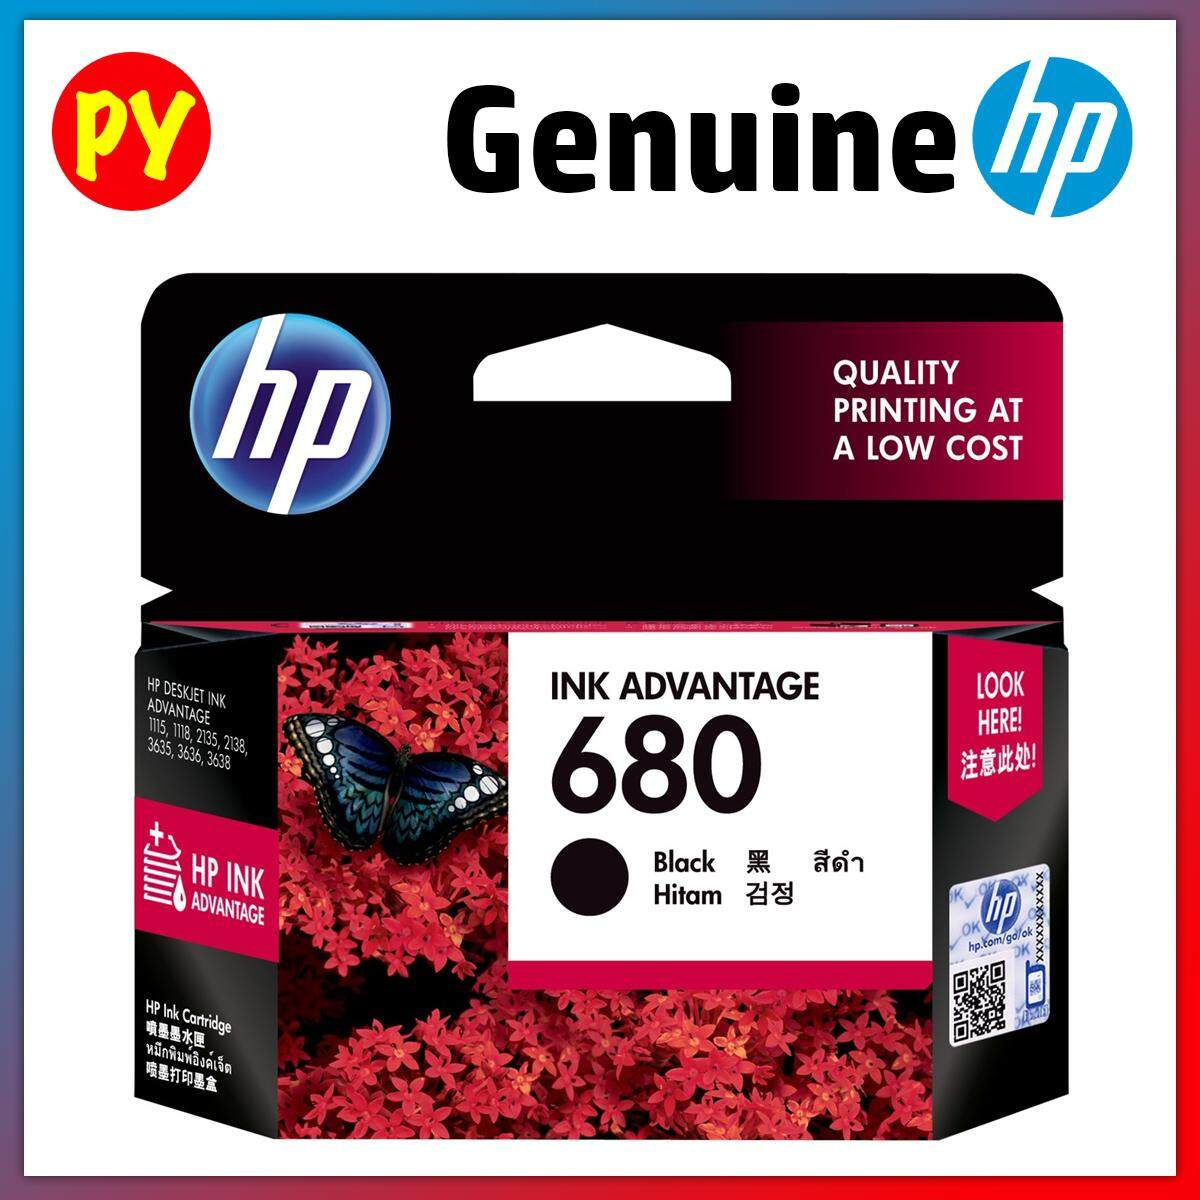 HP 680 Black Original Ink Advantage Cartridge (F6V27AA) -  for printer HP DJ 3835 / HP DJ 4535 / HP DJ 2135 / HP DJ 5075 New / HP DJ 5275 New / HP Advantage 2676 New